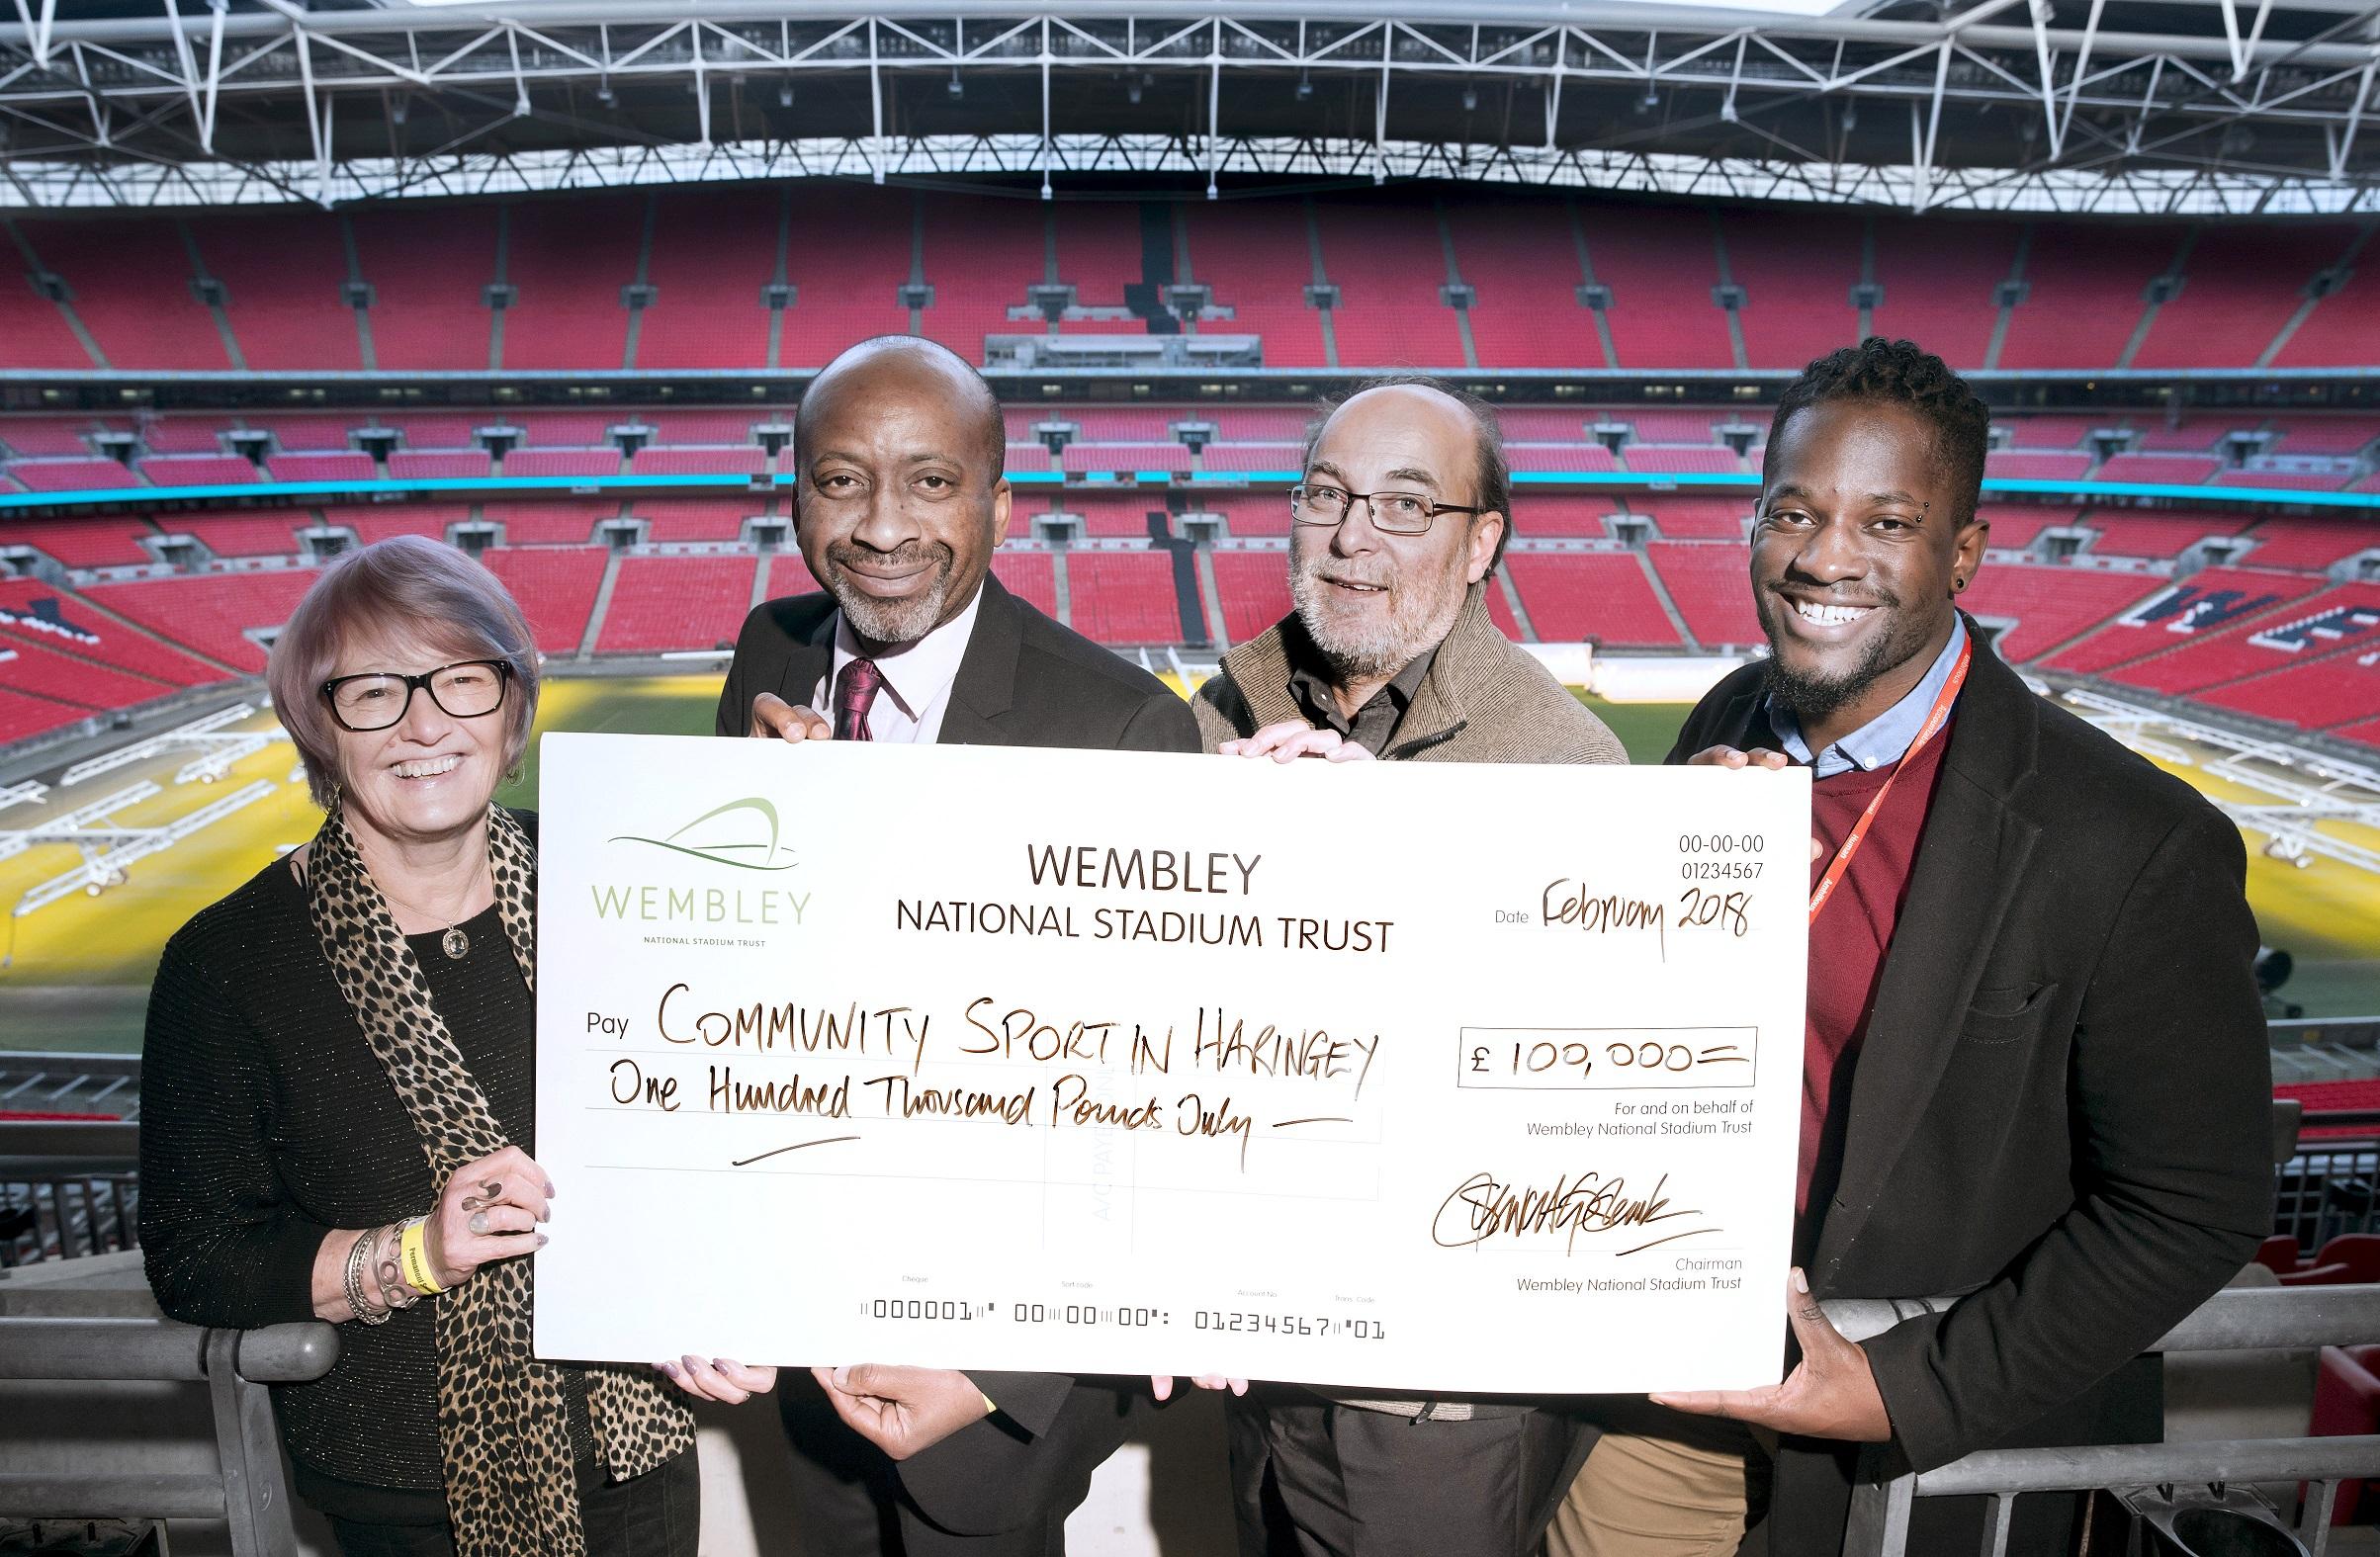 Ann John OBE - Wembley Stadium National Trust Trustee, Cllr Joseph Ejiofor, Stewart Goshawk - CEO of Wembley National Stadium Trust, Neville Graham- Haringey Council Interim Leisure Client Contract Manager